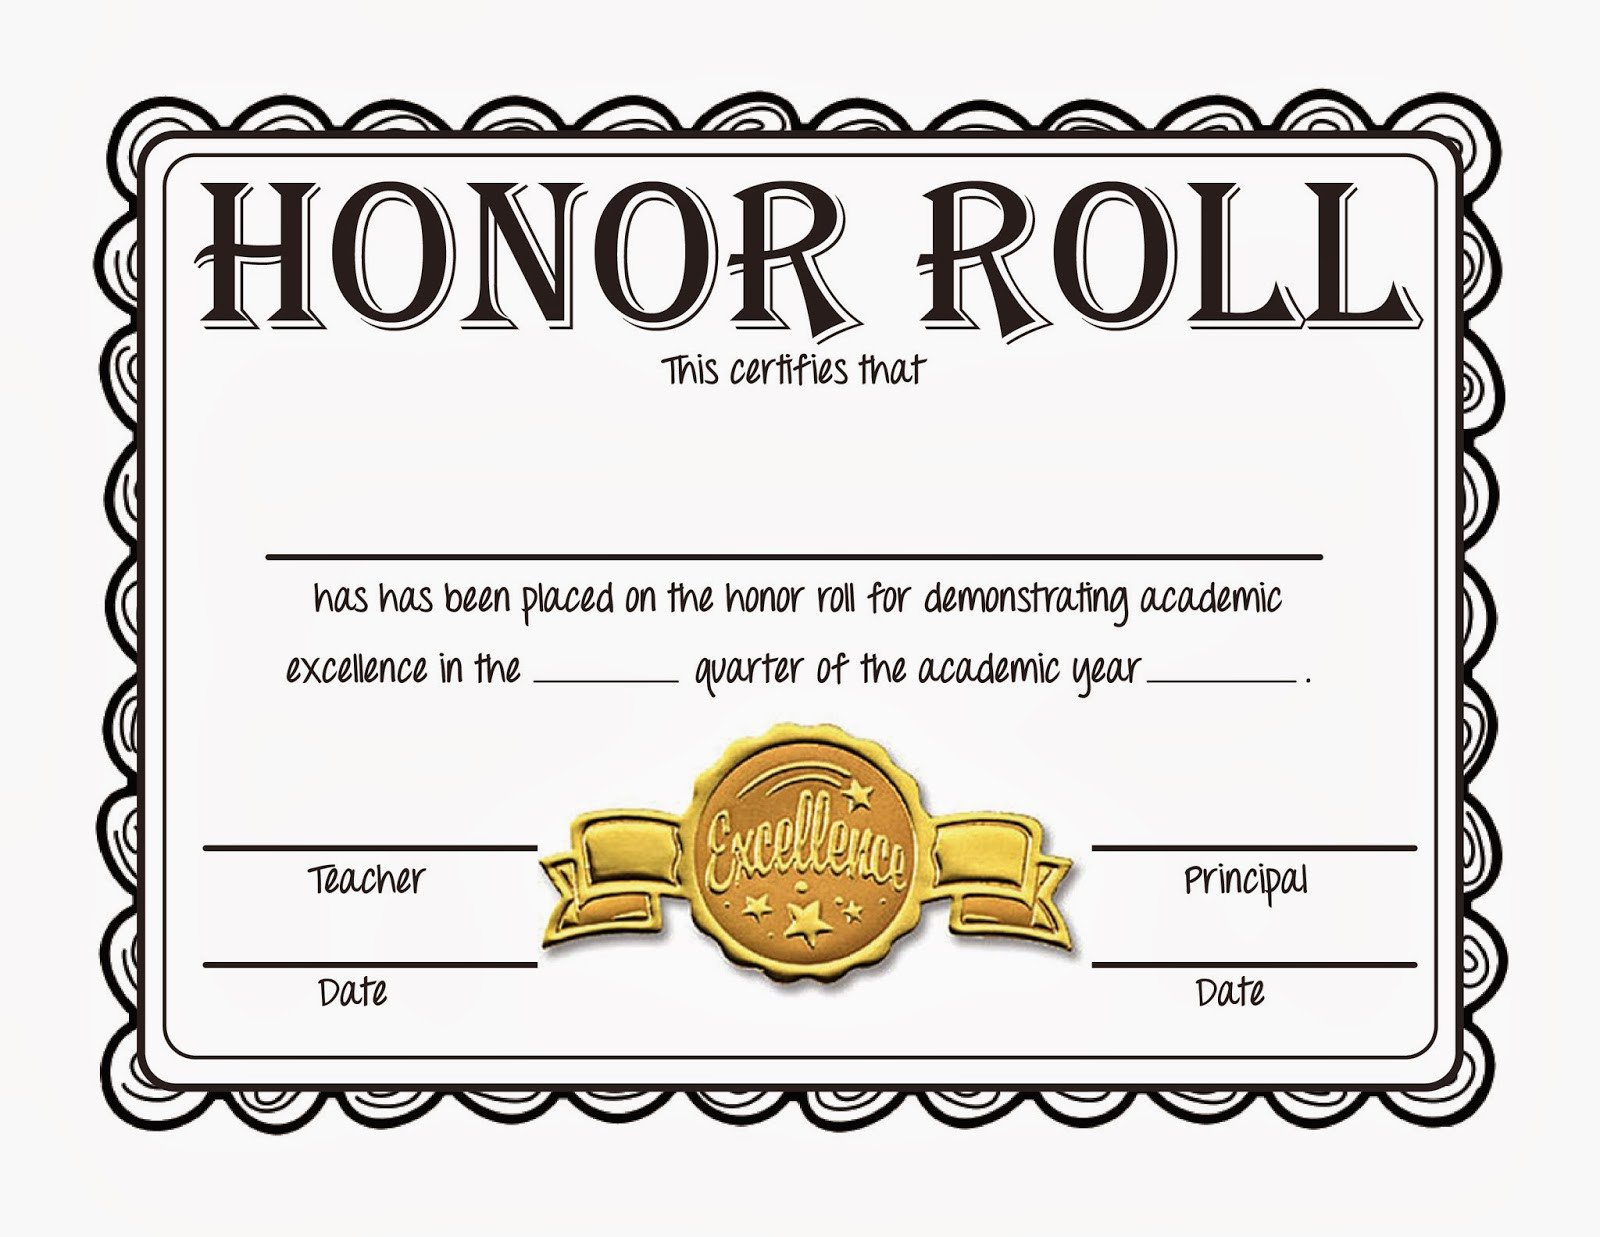 Honor Roll Certificate Template Steve S Classroom New Freebie Honor Roll Certificates